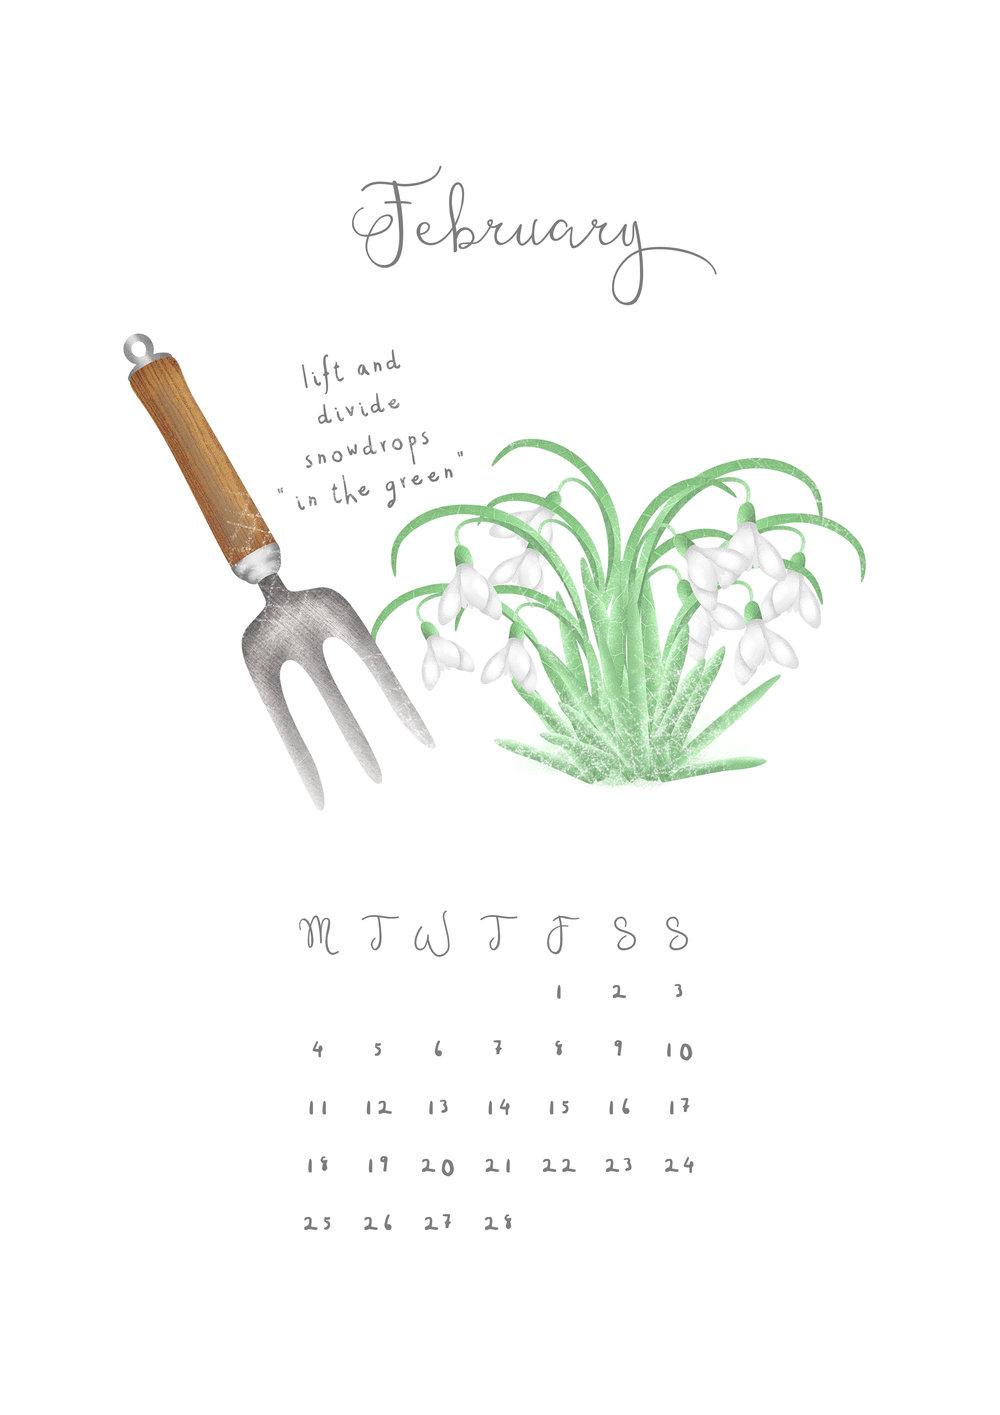 Hannah Weeks Illustration - February - Divide Snowdrops - A4.jpg